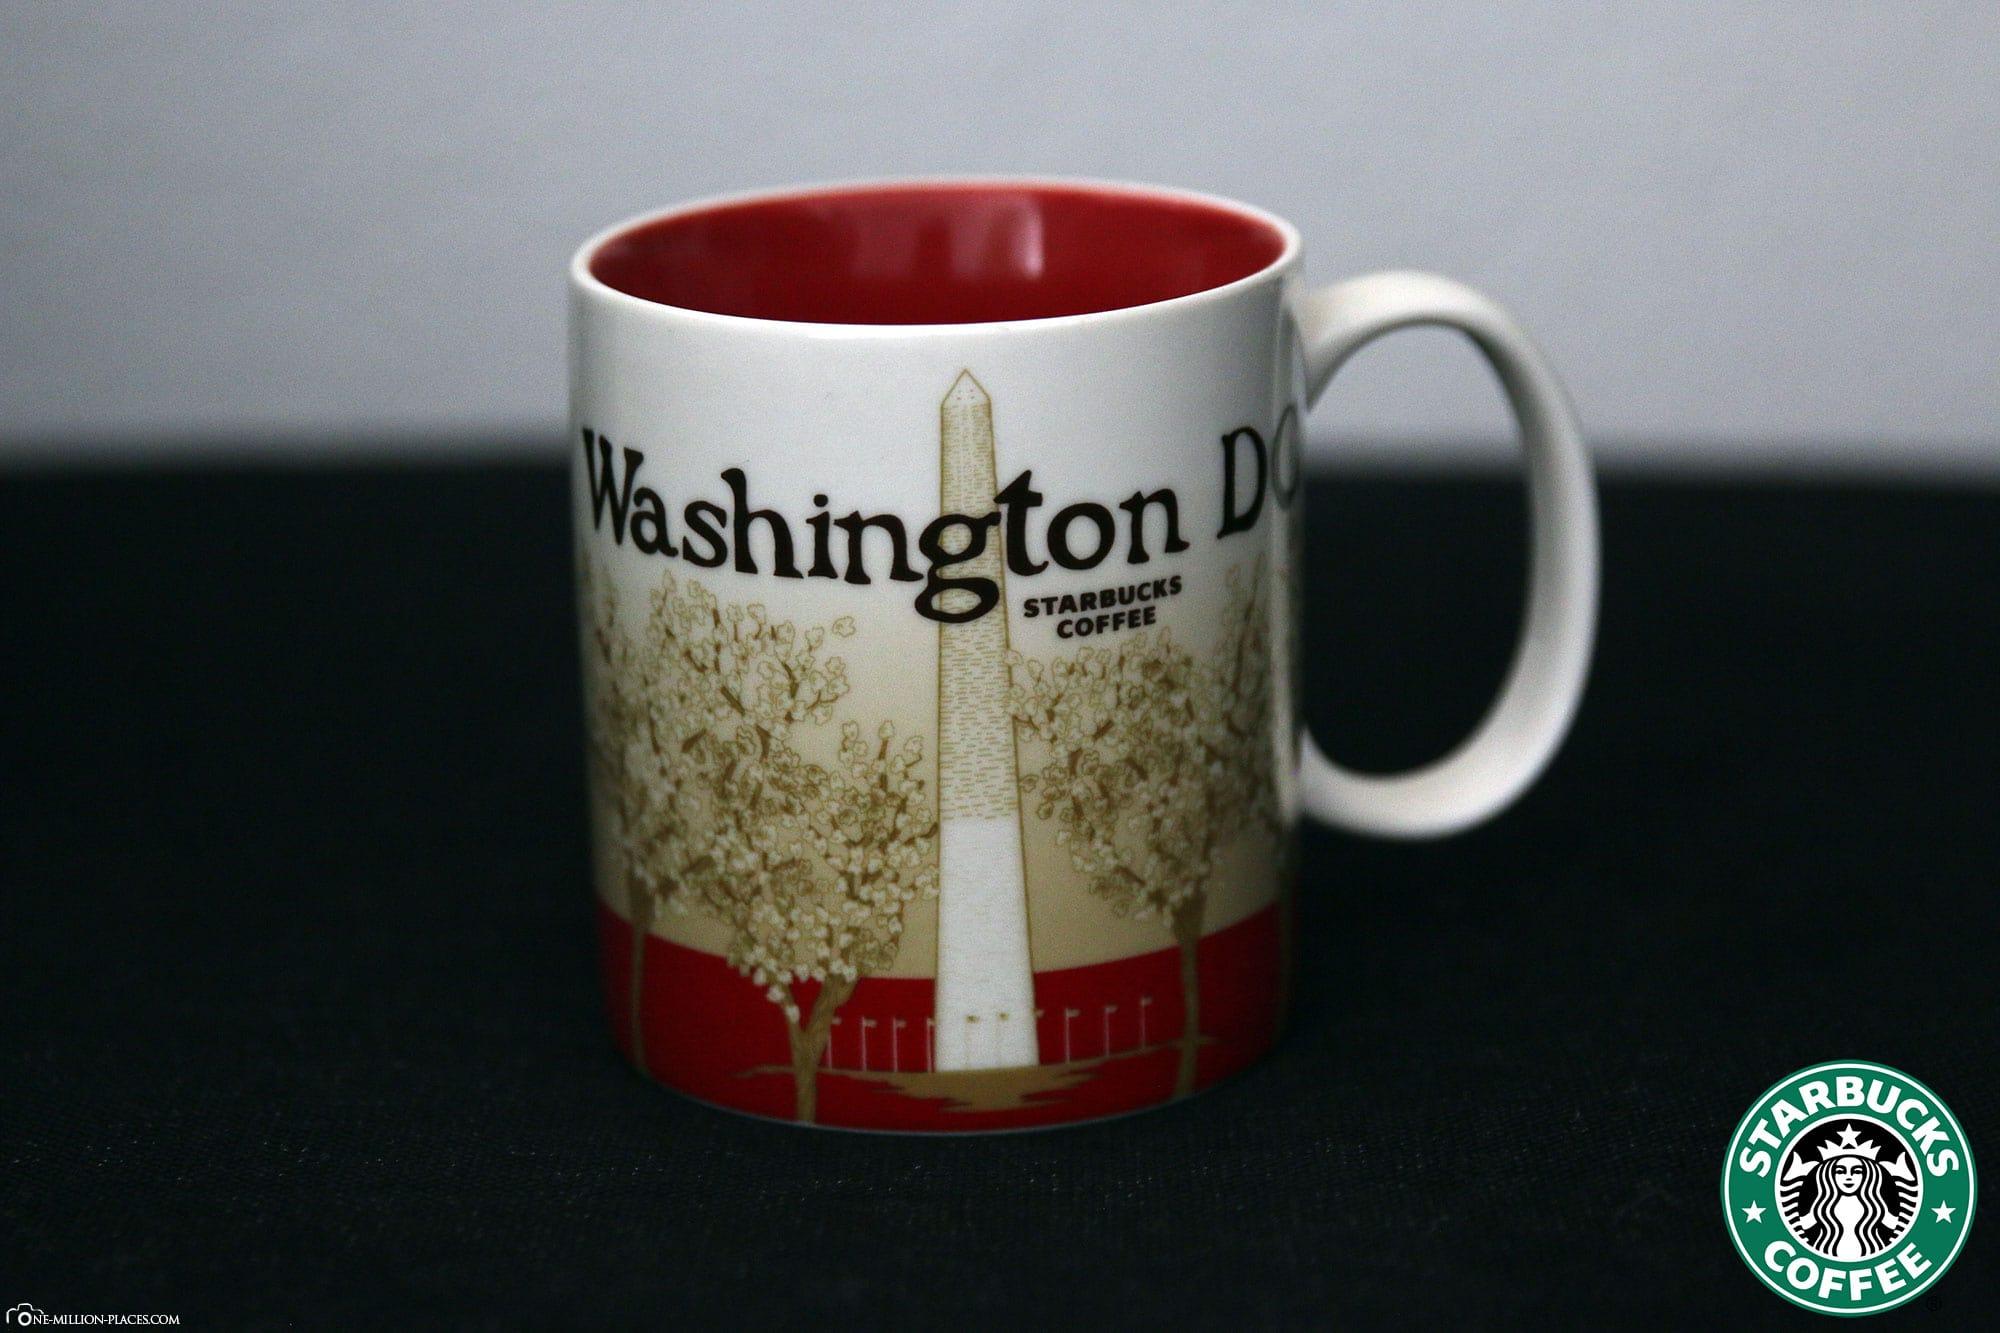 Washington DC, Starbucks Tasse, Global Icon Serie, City Mugs, Sammlung, USA, Reisebericht